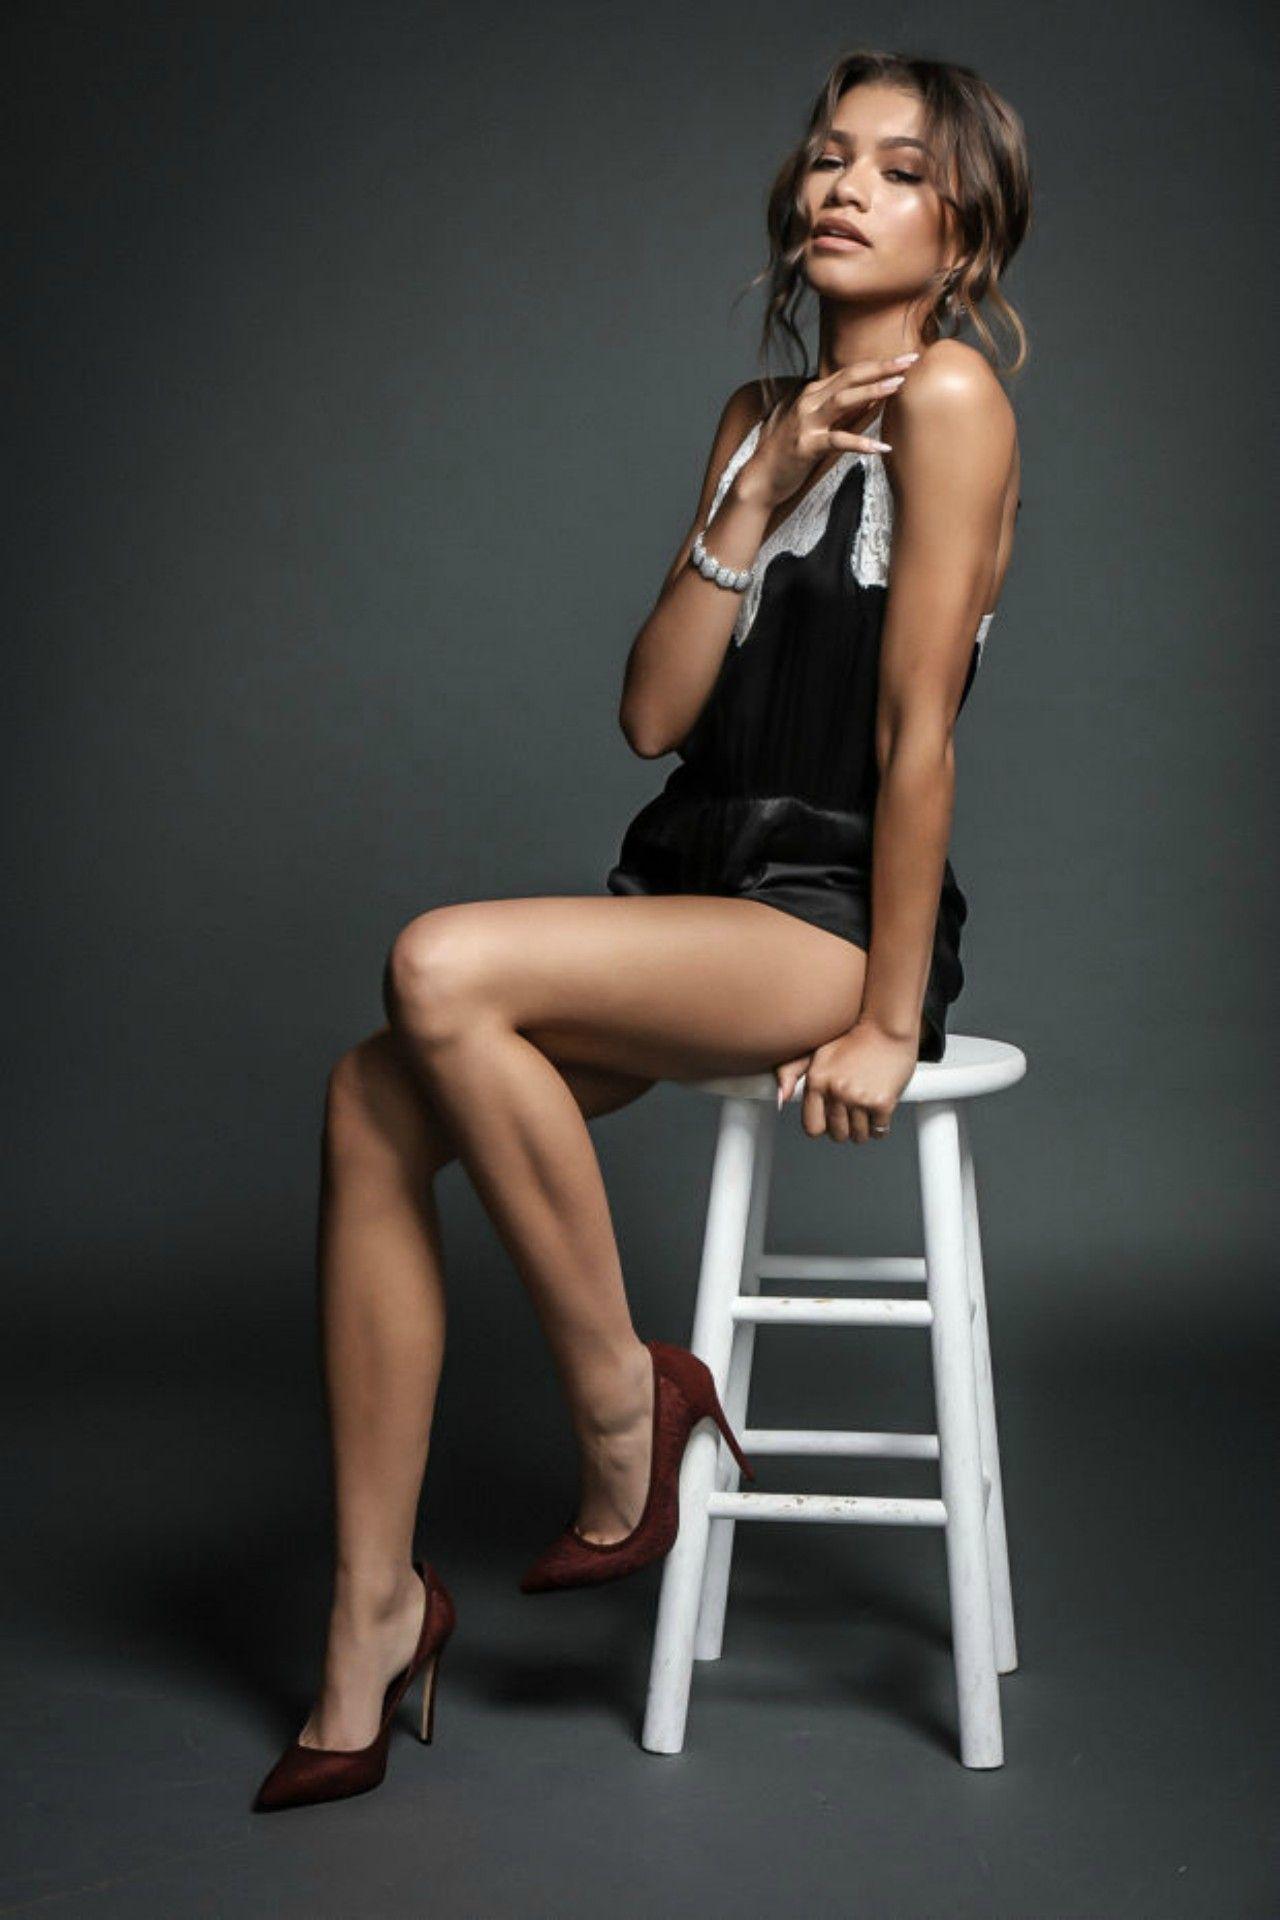 Watch Zendaya In Sheer Stockings Photo Shoot video